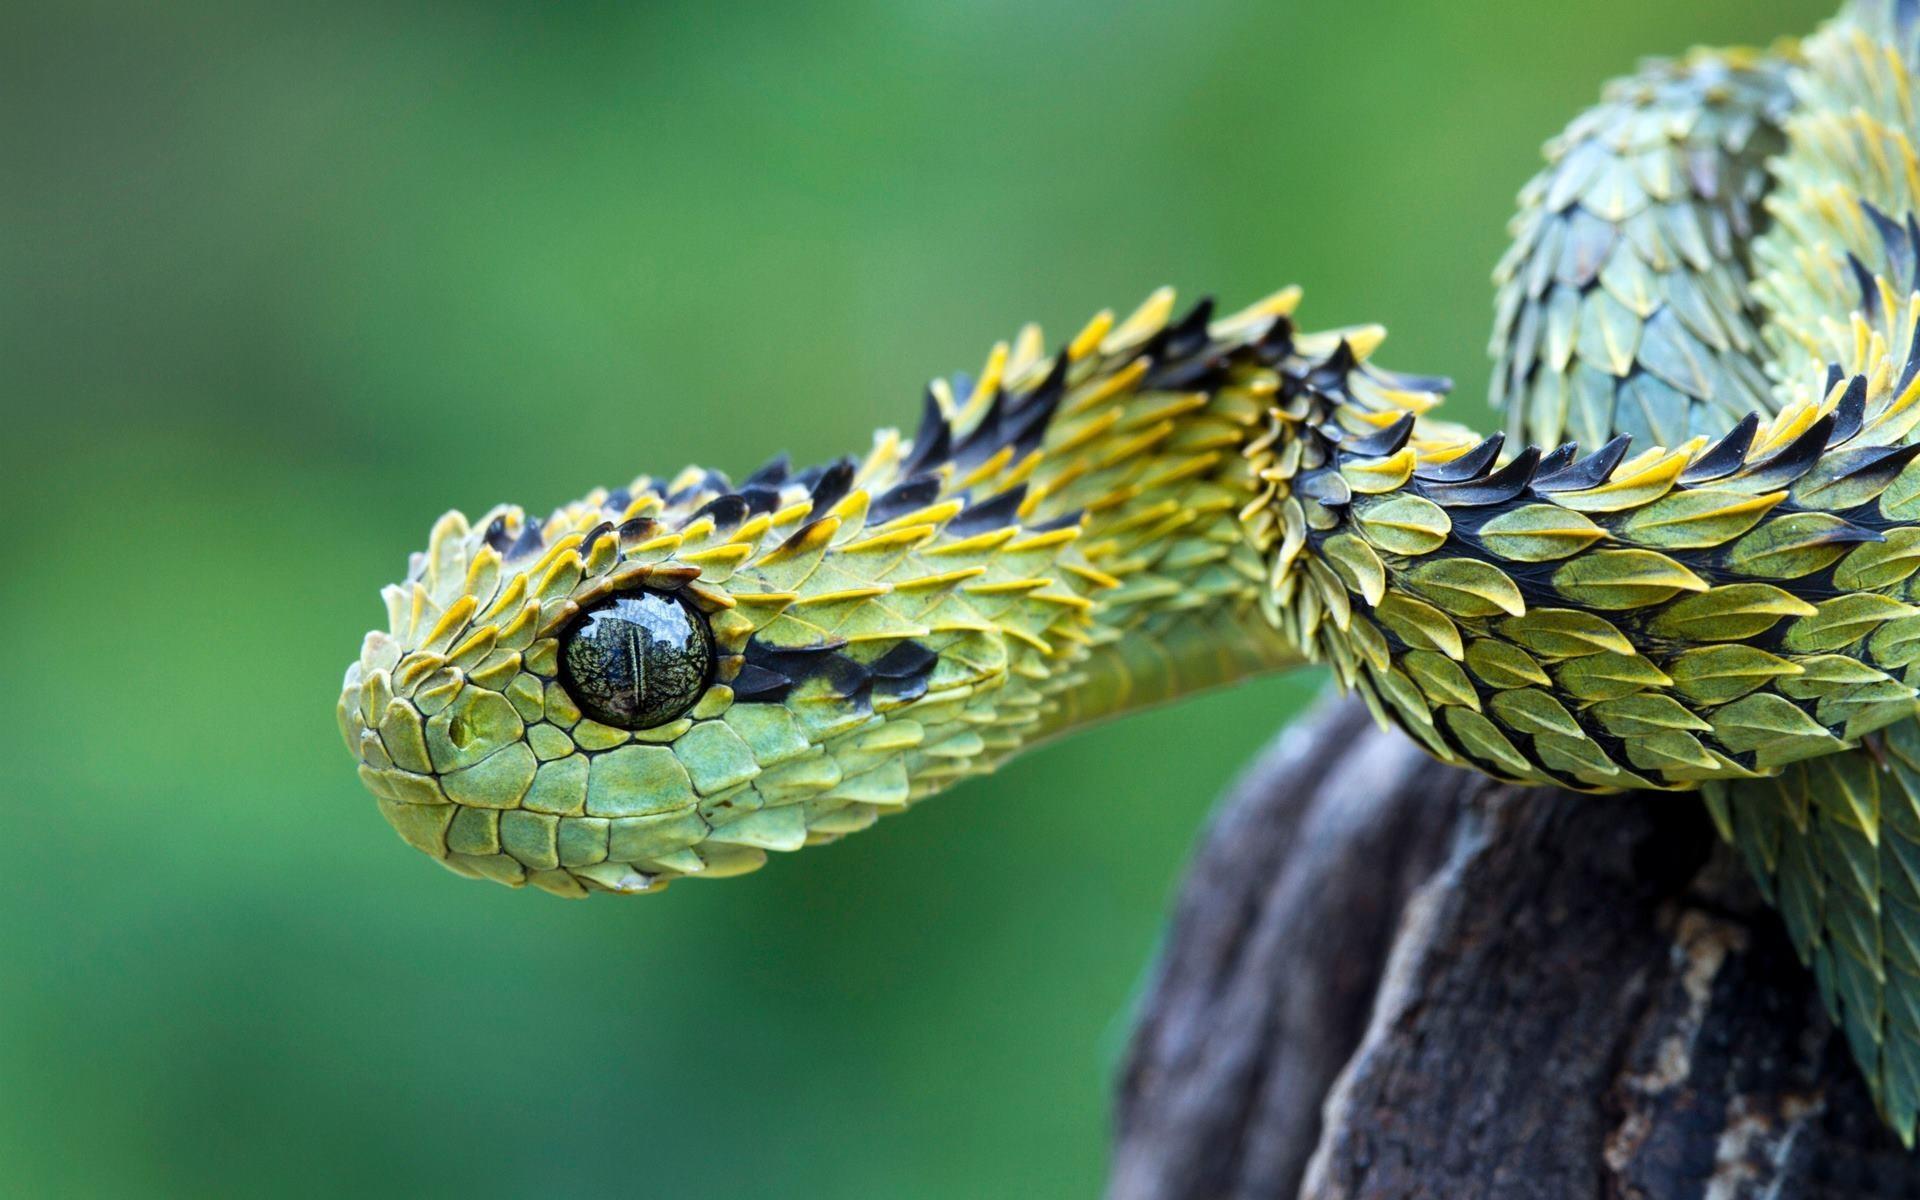 General 1920x1200 animals macro nature vipers reptiles